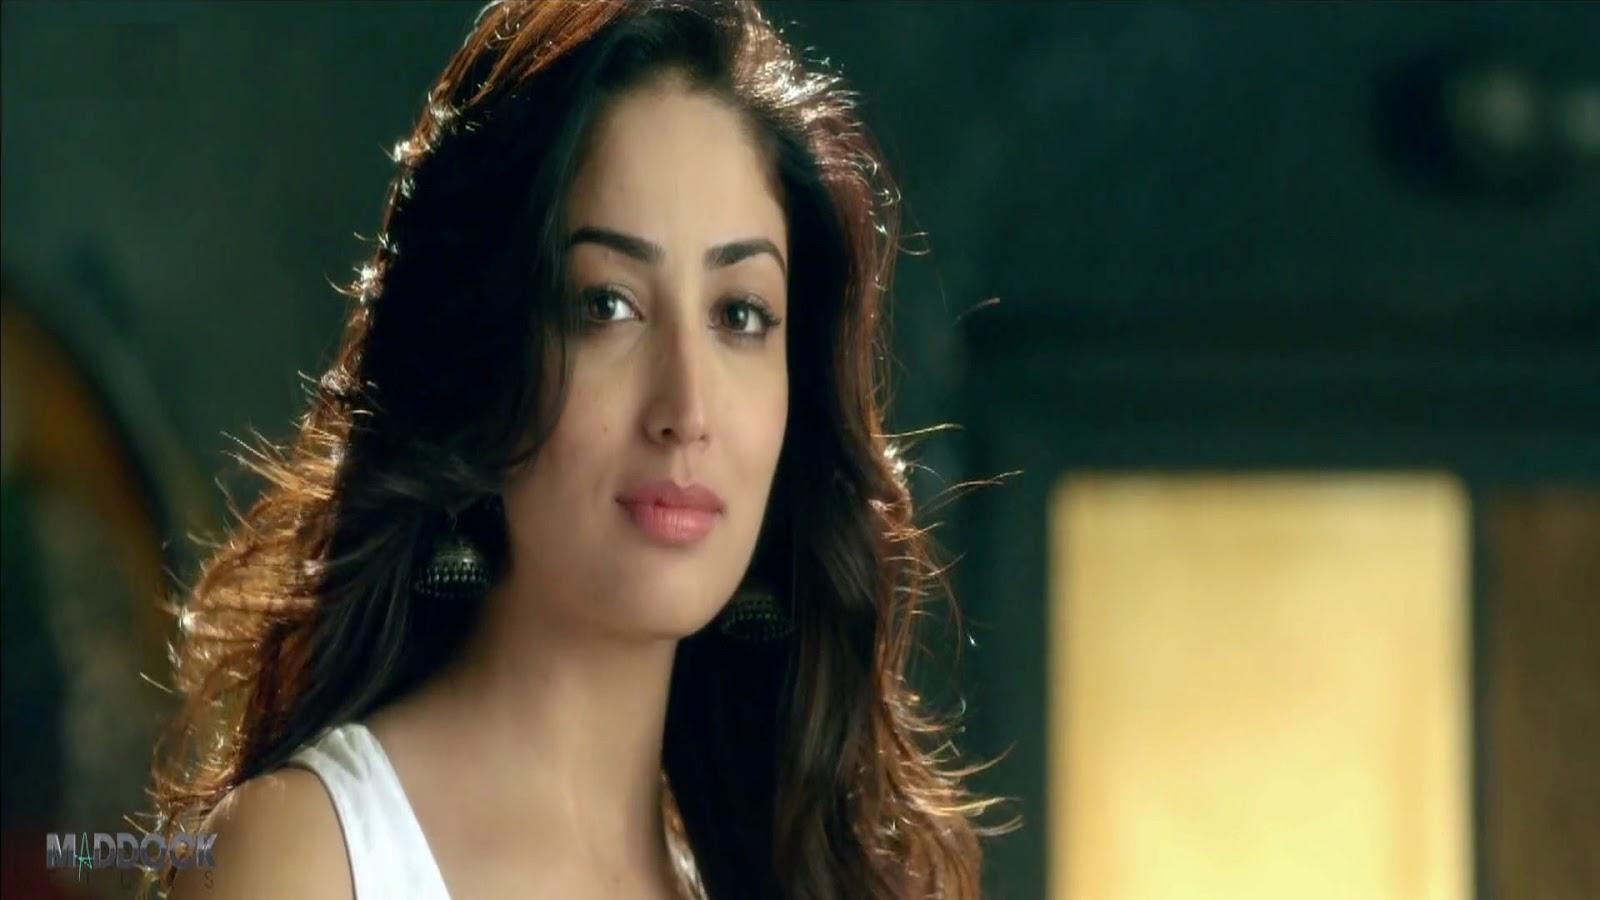 Amazing Wallpaper Movie Kabil - Cute_Actress_Yami_Gautam_Close_Up_Face_in_Bollywood_Movie_Badlapur_Wallpaper  Perfect Image Reference_545395.jpg?ssl\u003d1